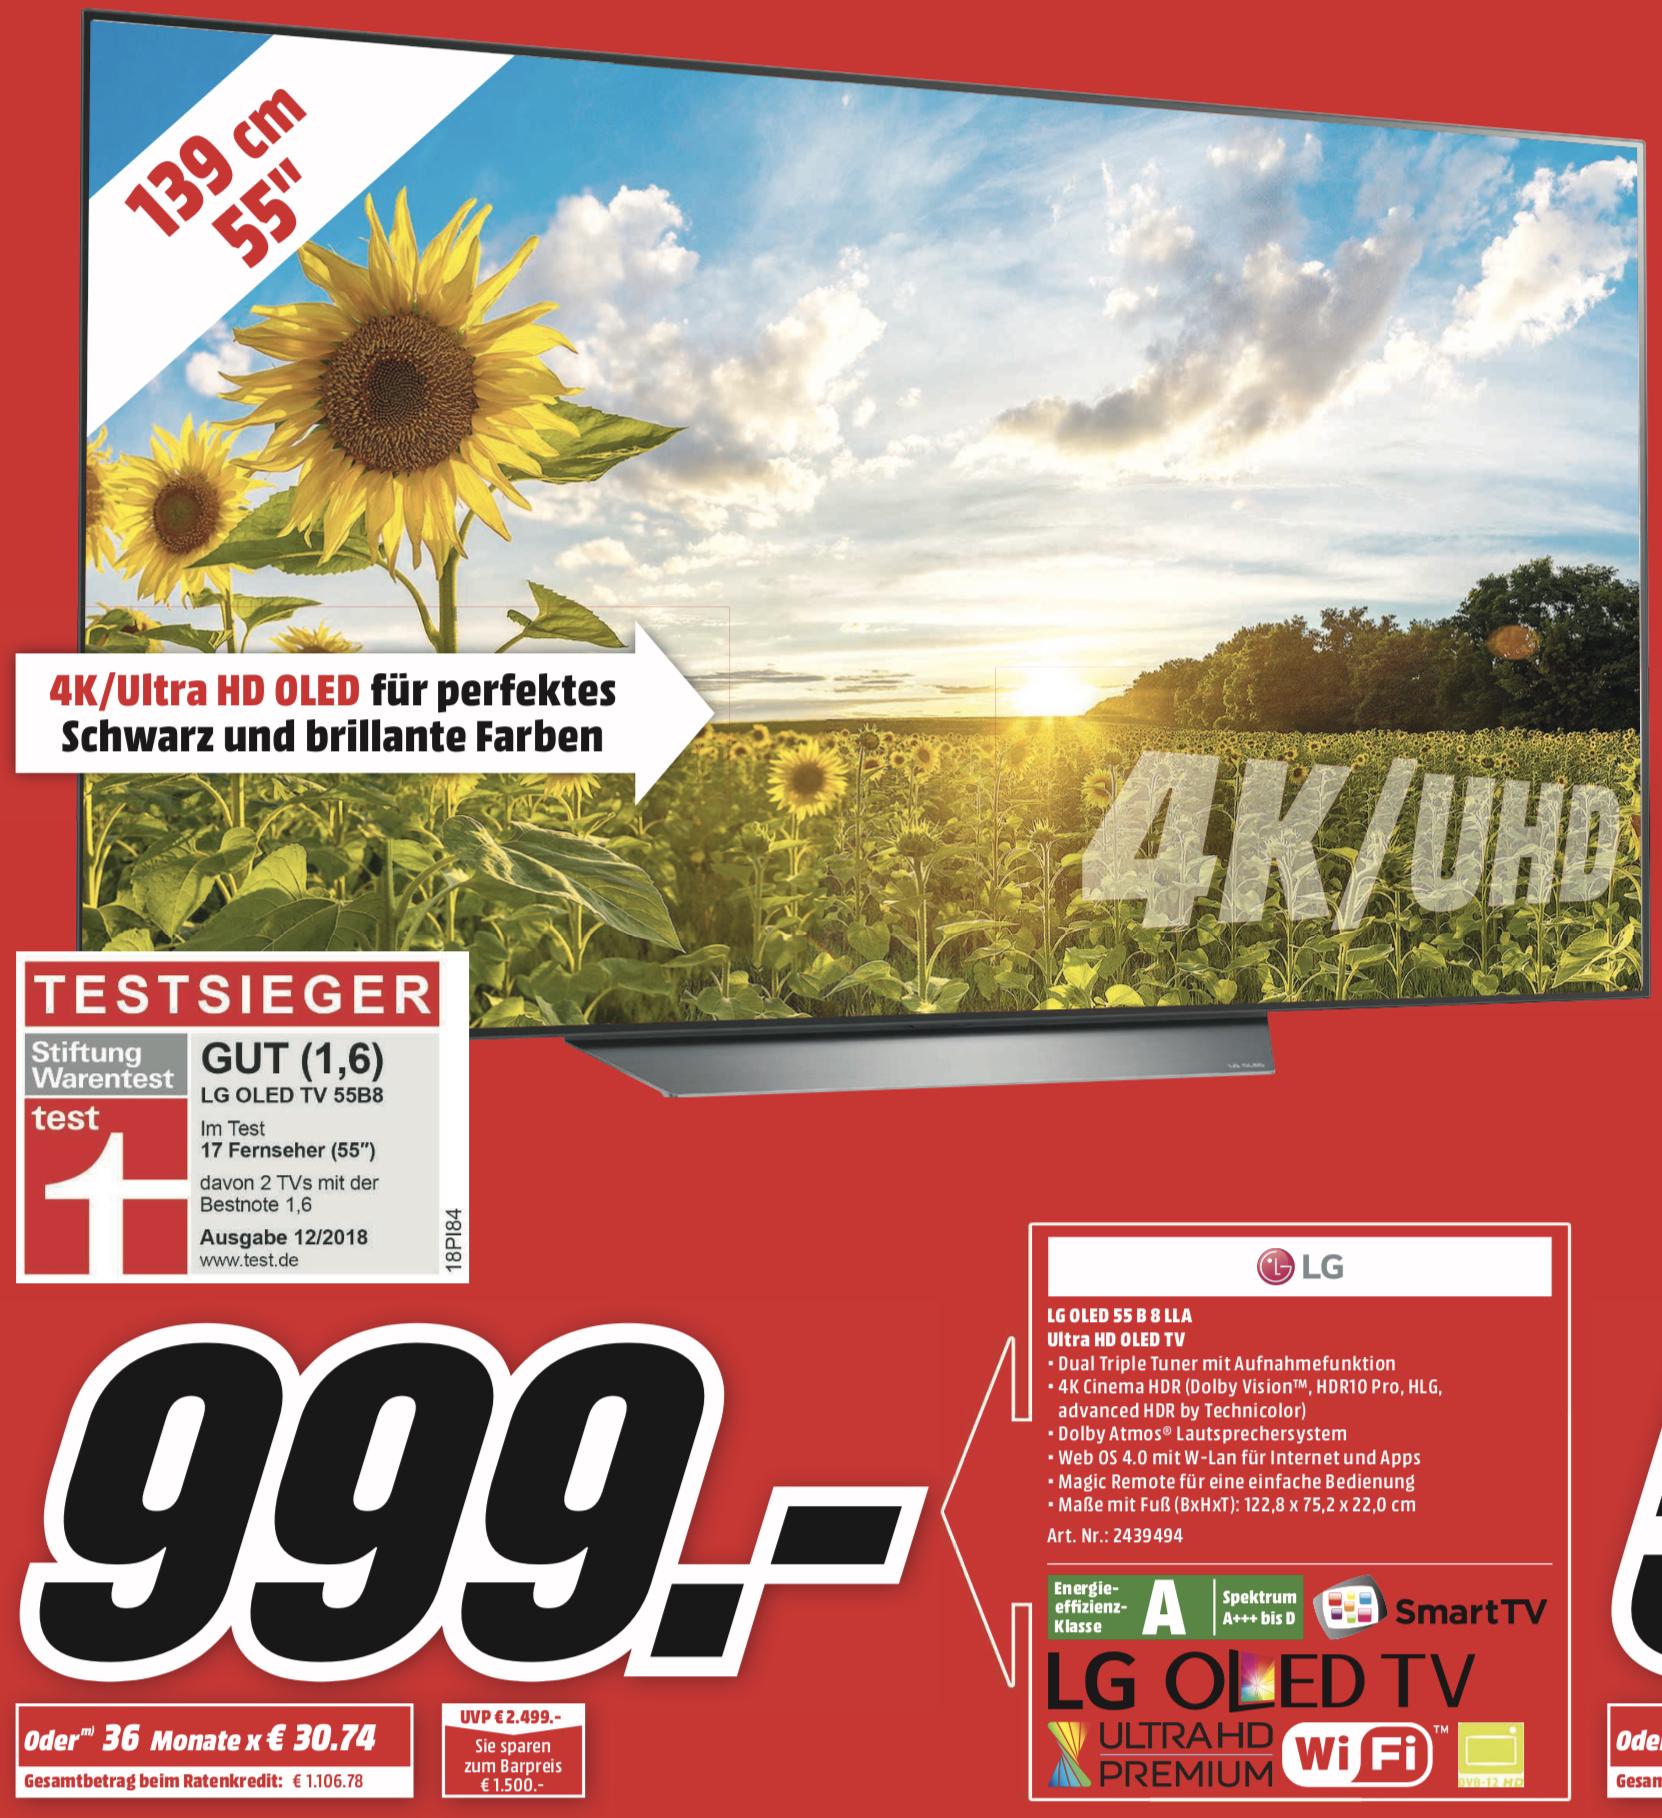 LG OLED55B8LLA OLED TV 55 Zoll 139cm 4K UHD SMART TV webOS 4.0 AI ThinQ für 999€ - Lokal MediaMarkt Hamburg, Halstenbek u. Henstedt-Ulzburg